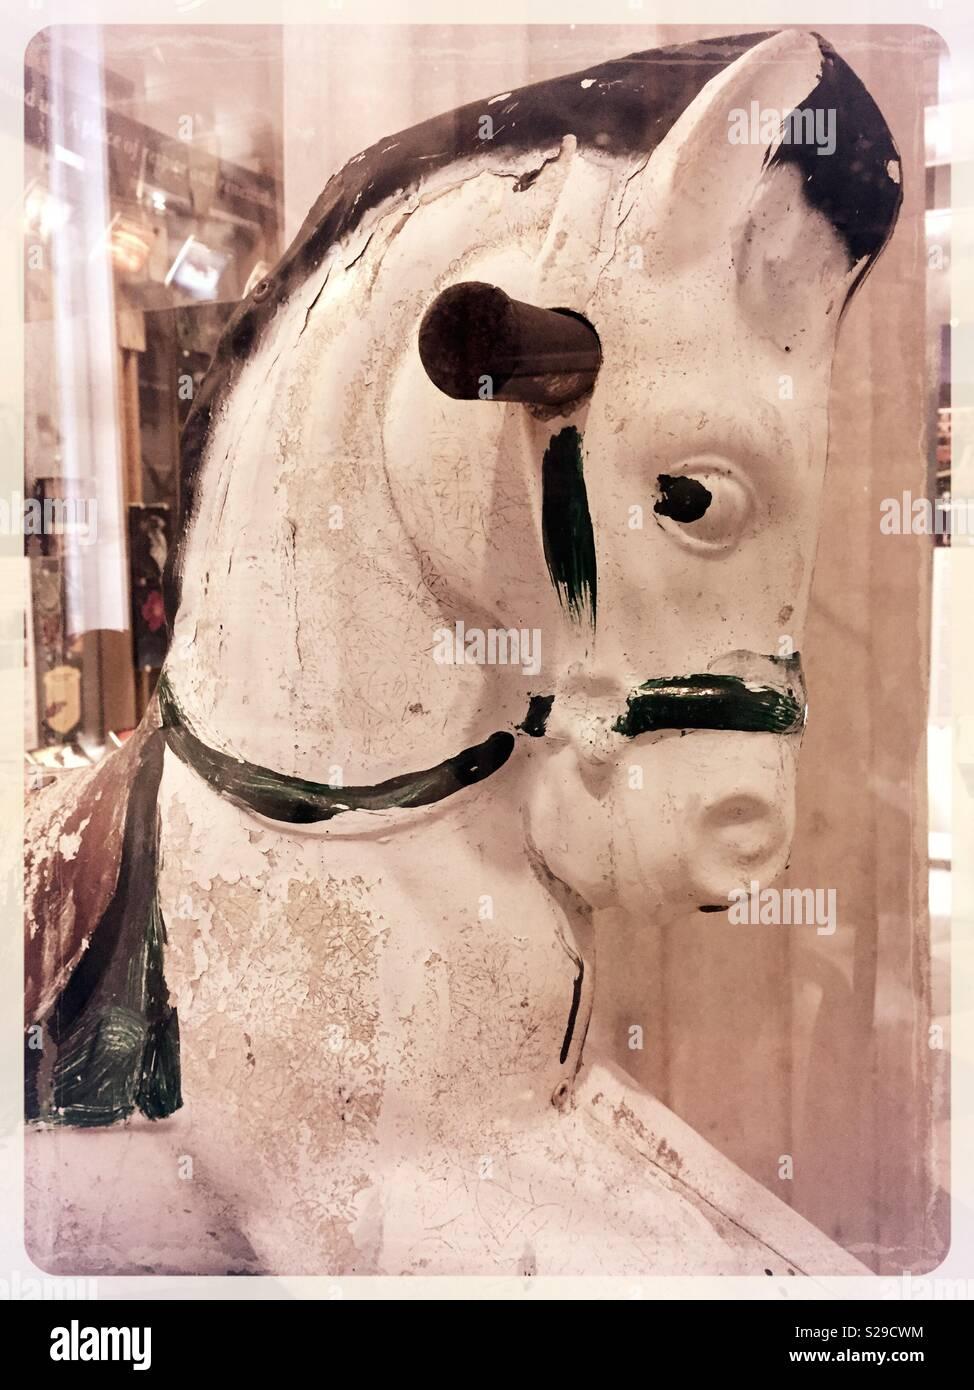 Vintage wooden rocking horse, USA - Stock Image